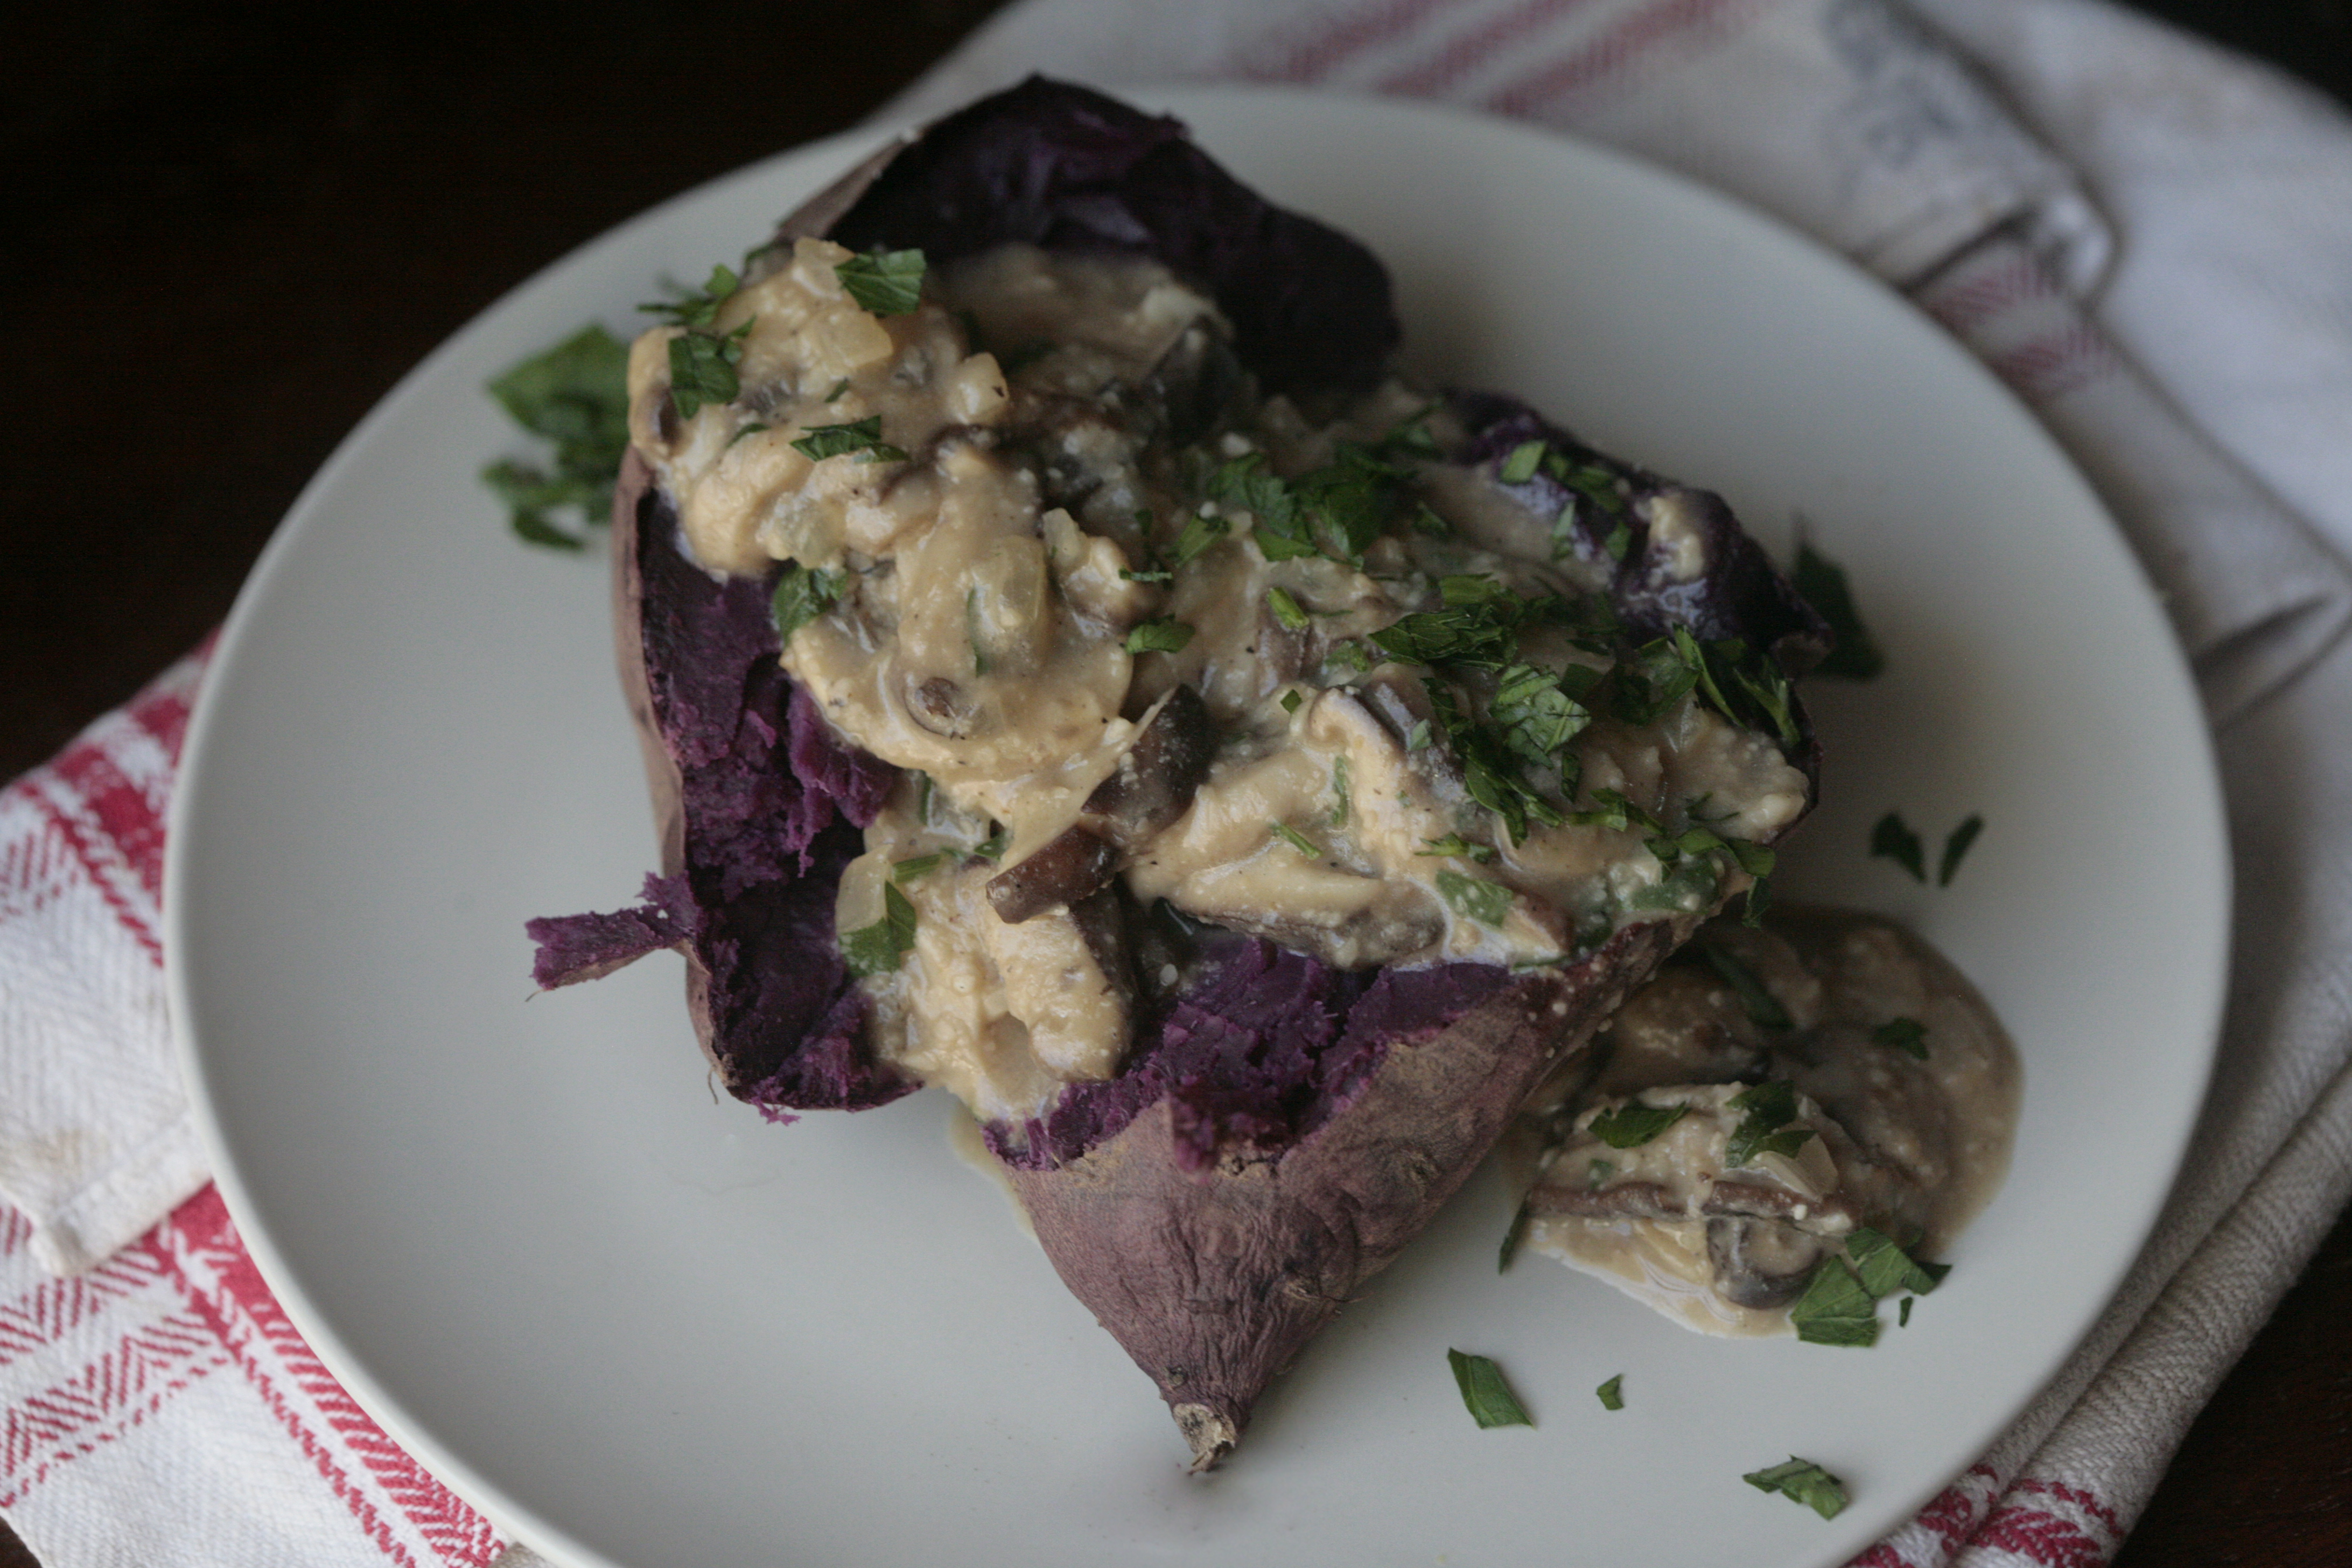 purple sweet potato and mushroom gravy